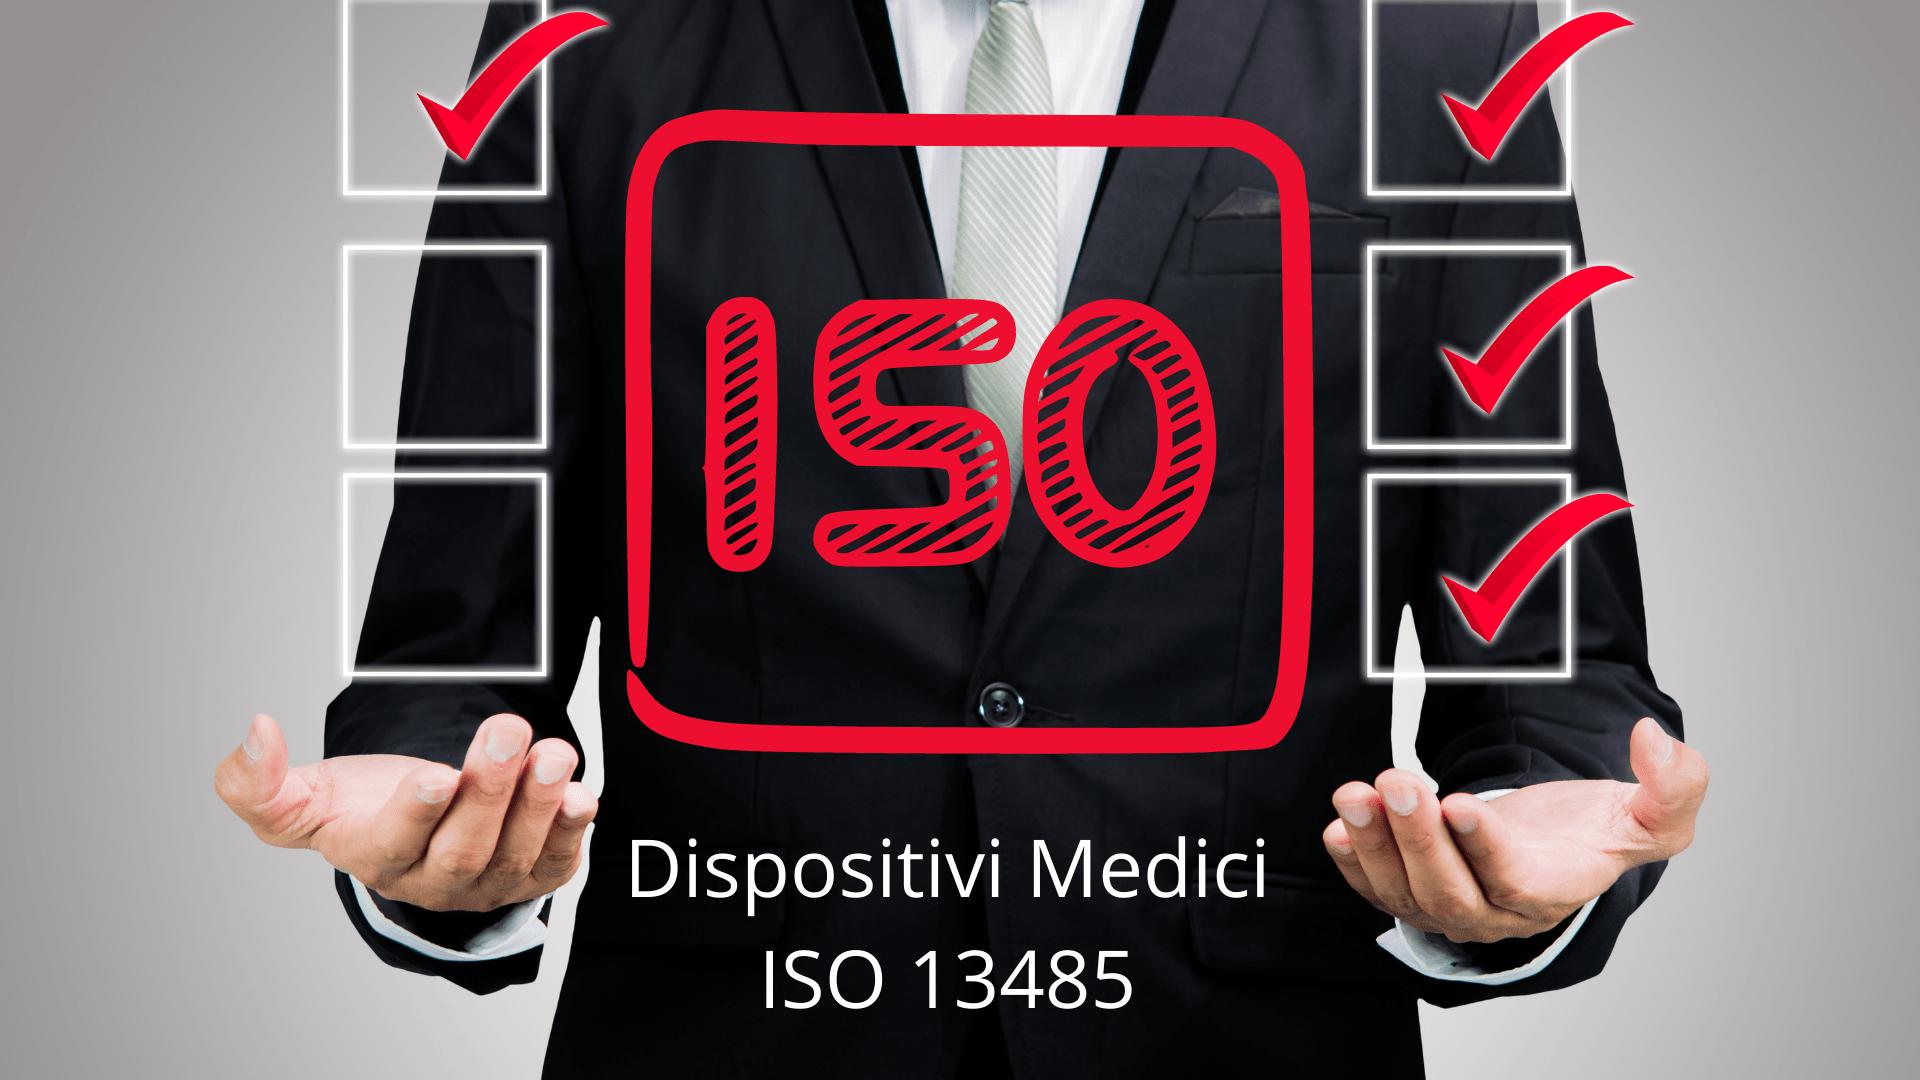 Dispositivi Medici ISO 13485